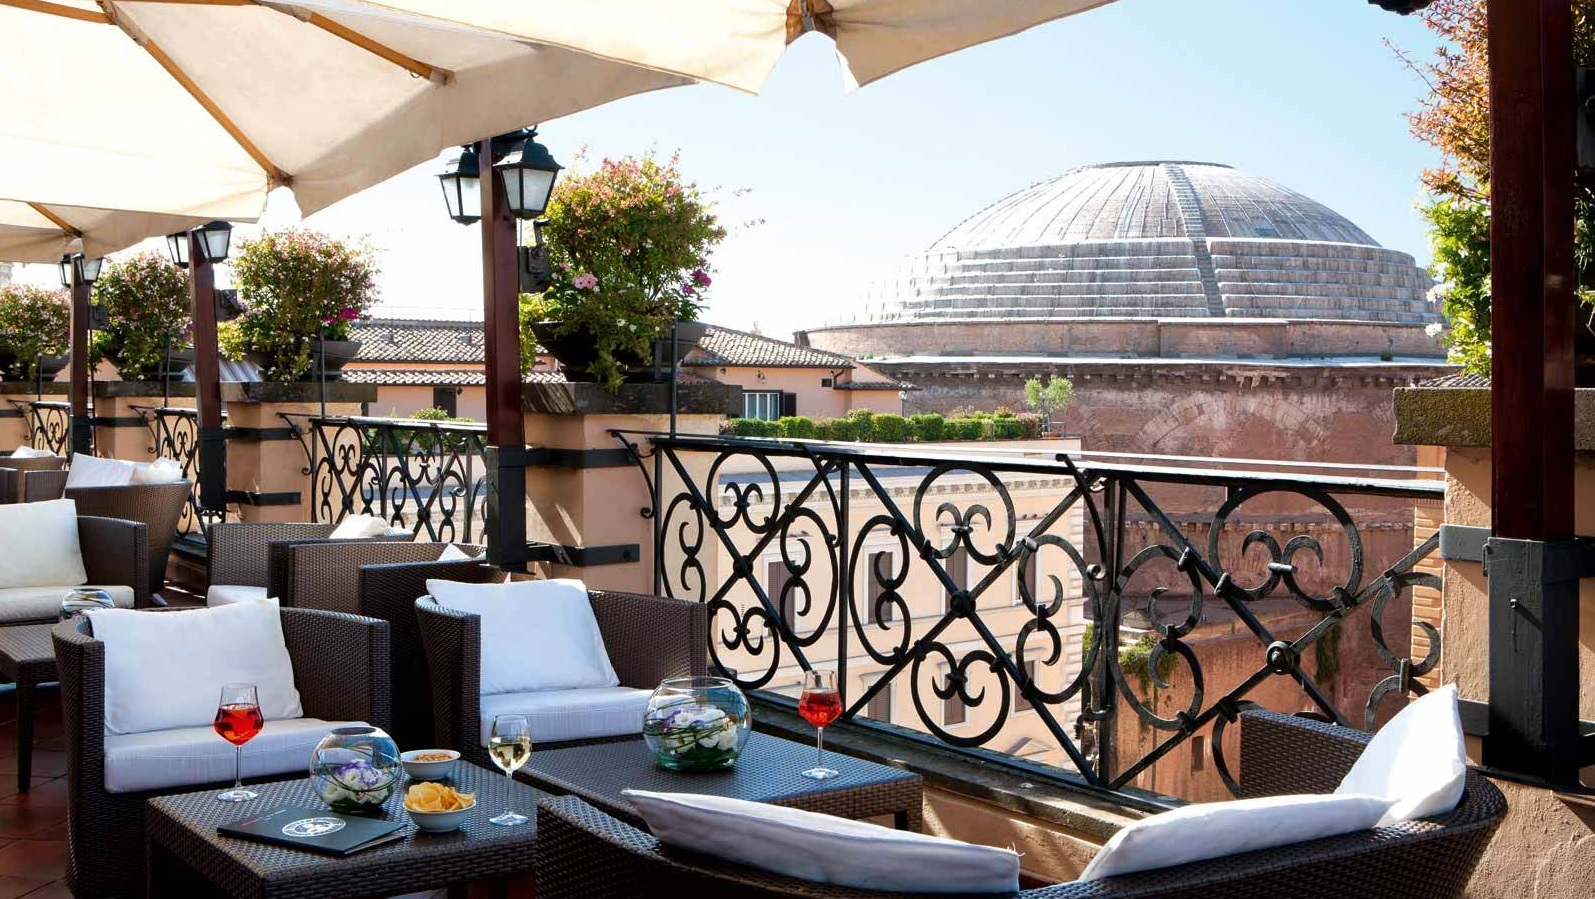 Brunch Minerva Roof Garden 00186 Roma Oubruncher